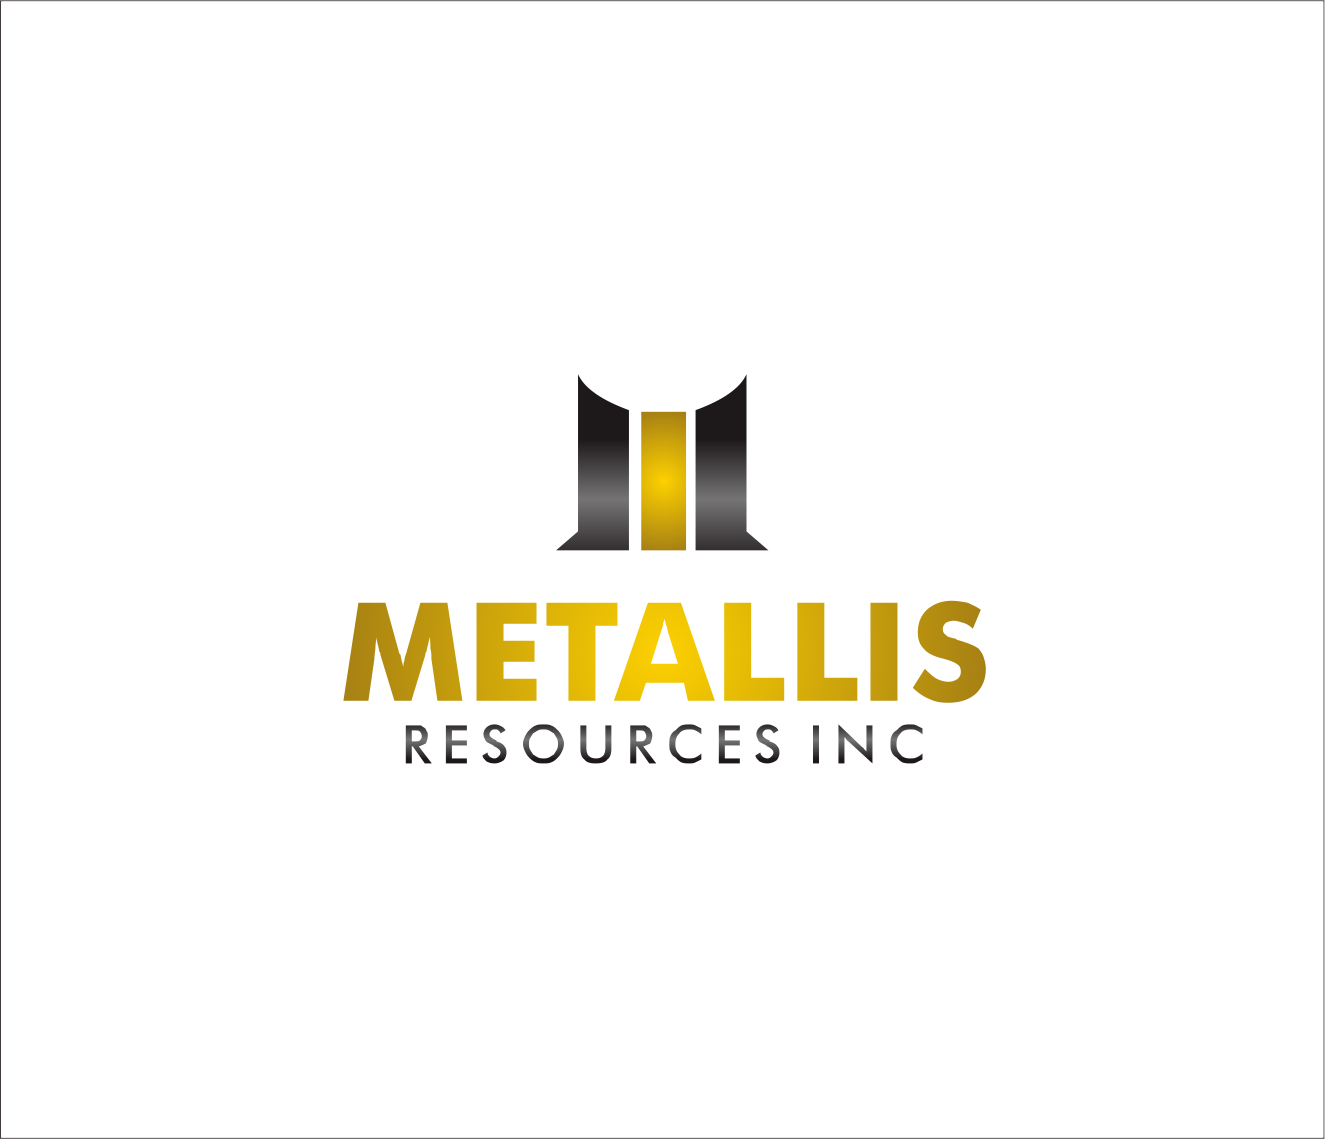 Logo Design by Armada Jamaluddin - Entry No. 144 in the Logo Design Contest Metallis Resources Inc Logo Design.